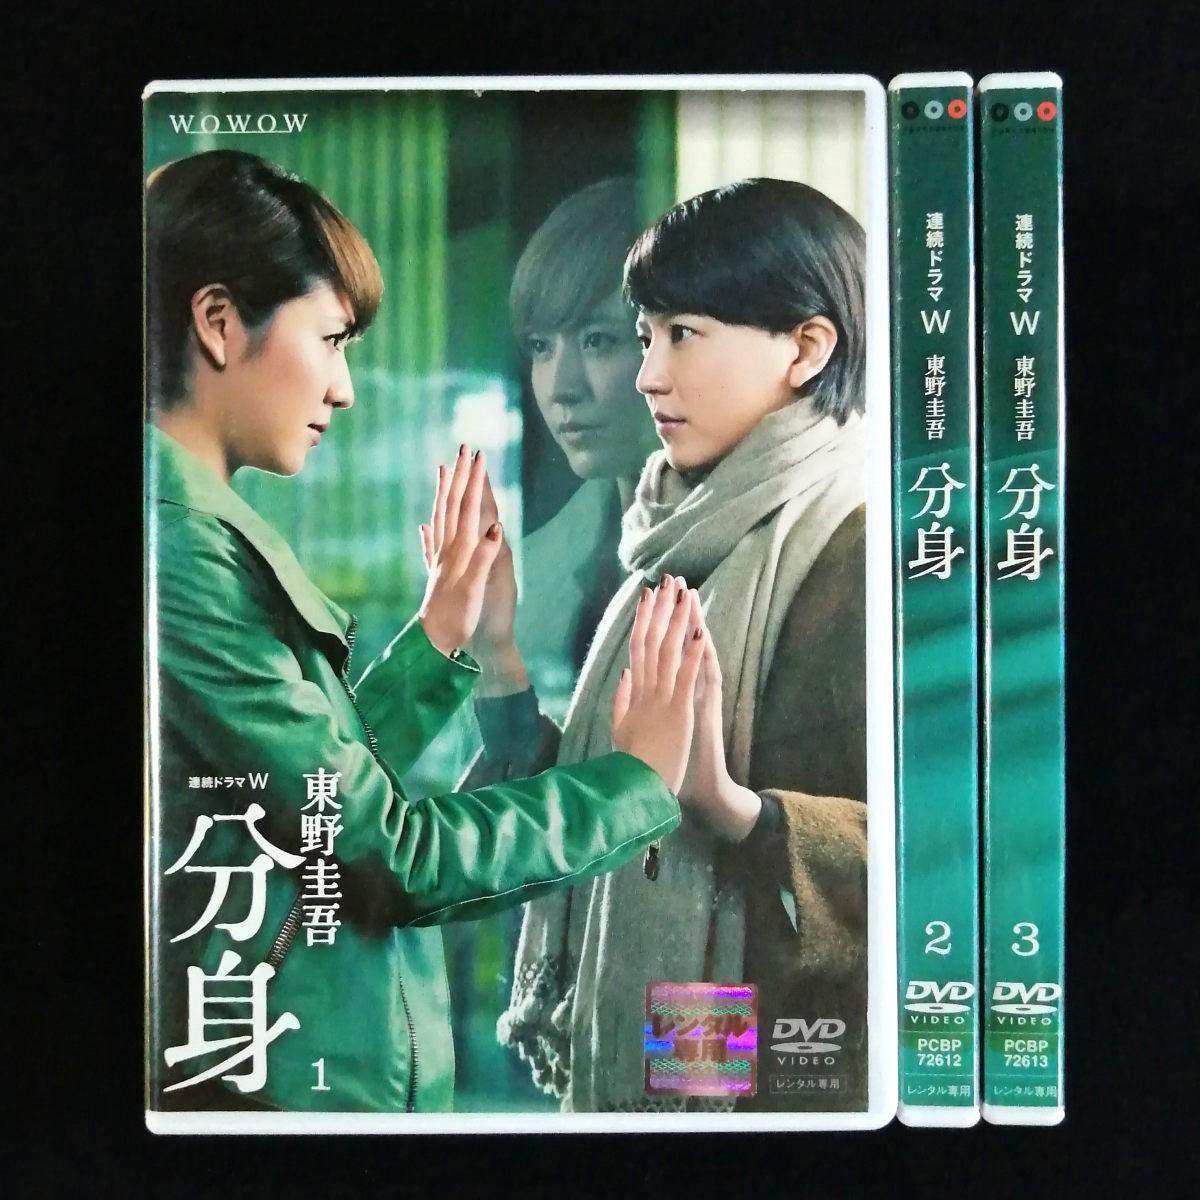 DVD 連続ドラマW 東野圭吾 「分身」 全3巻セット レンタル版